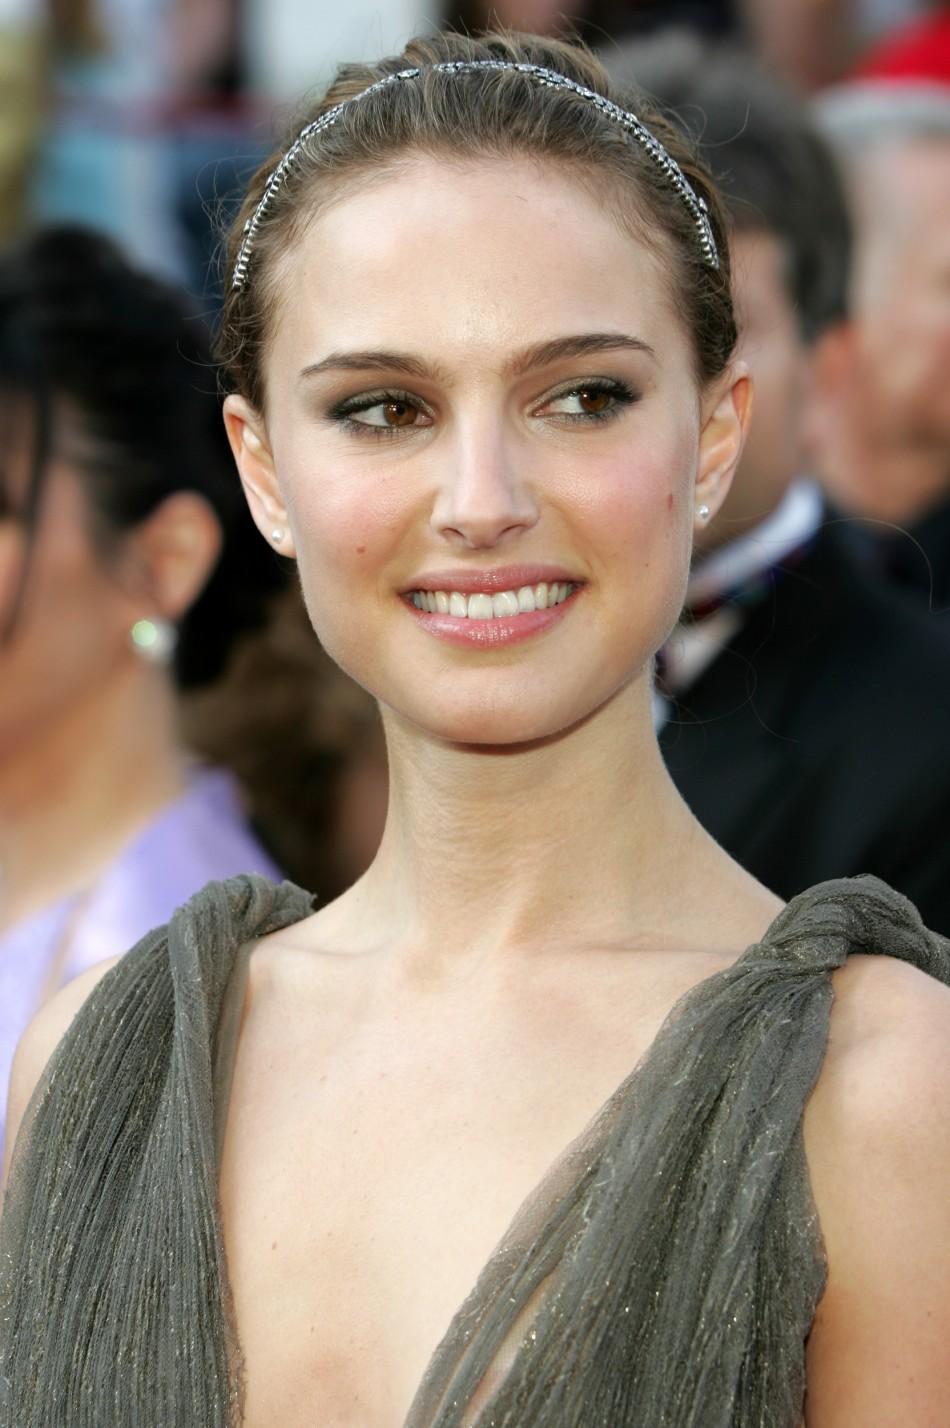 Natalie Portman: Natalie Portman Body